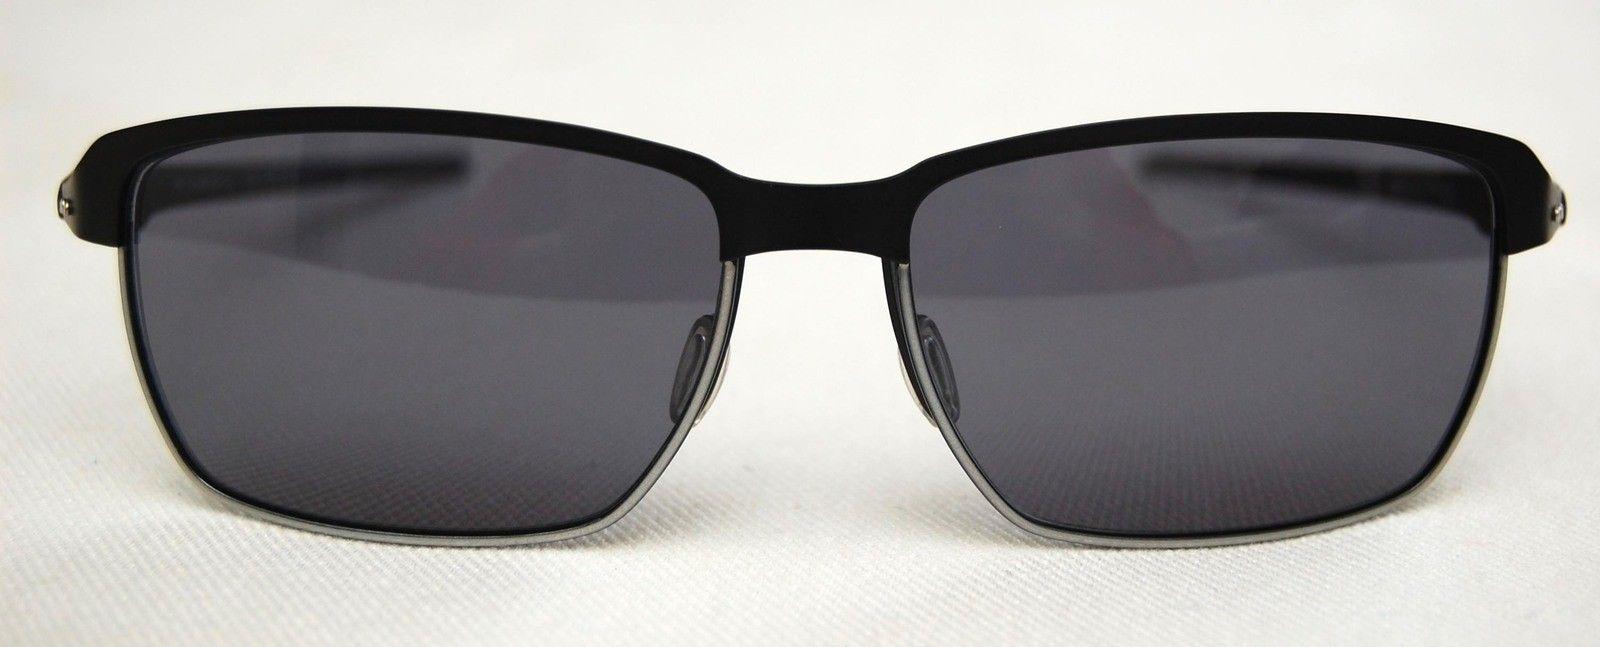 Tinfoil Carbon OO6018-01 Matte Black / Silver   Grey Lens - 03.jpg